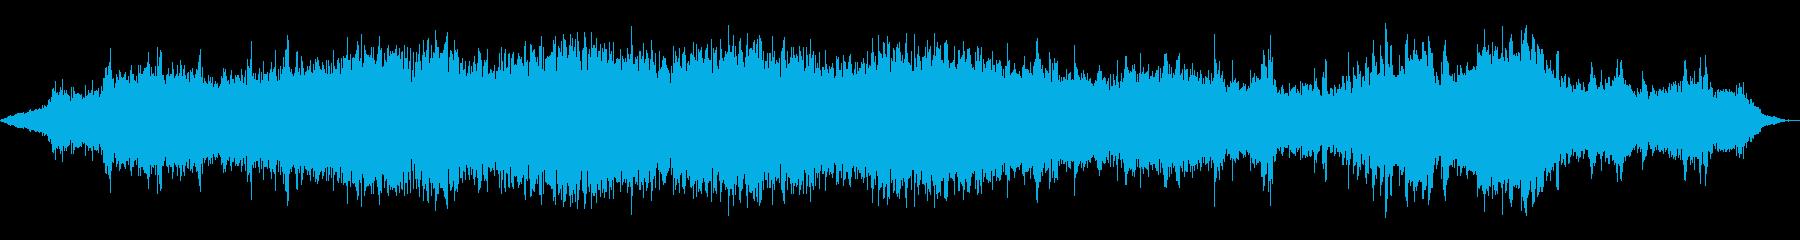 SHARP ELECTRONIC ...の再生済みの波形